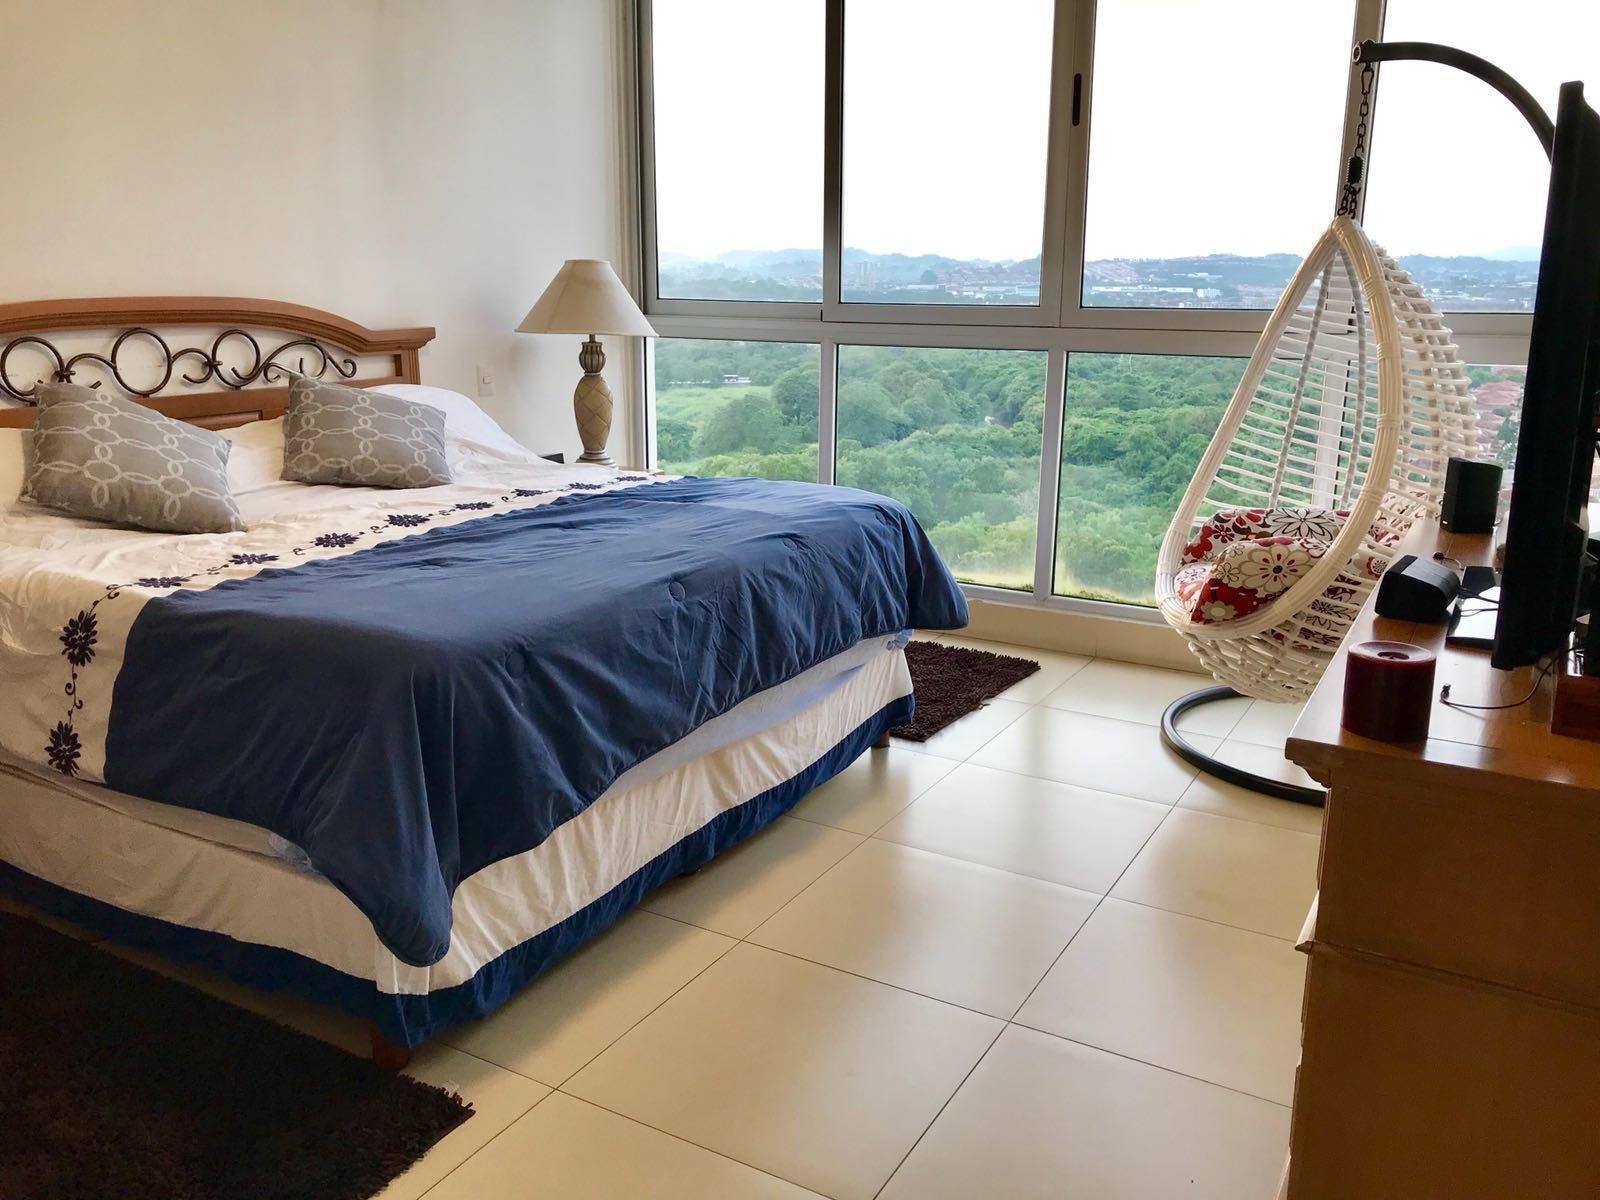 Apartamento Panama>Panama>Costa del Este - Venta:375.000 US Dollar - codigo: 21-11406